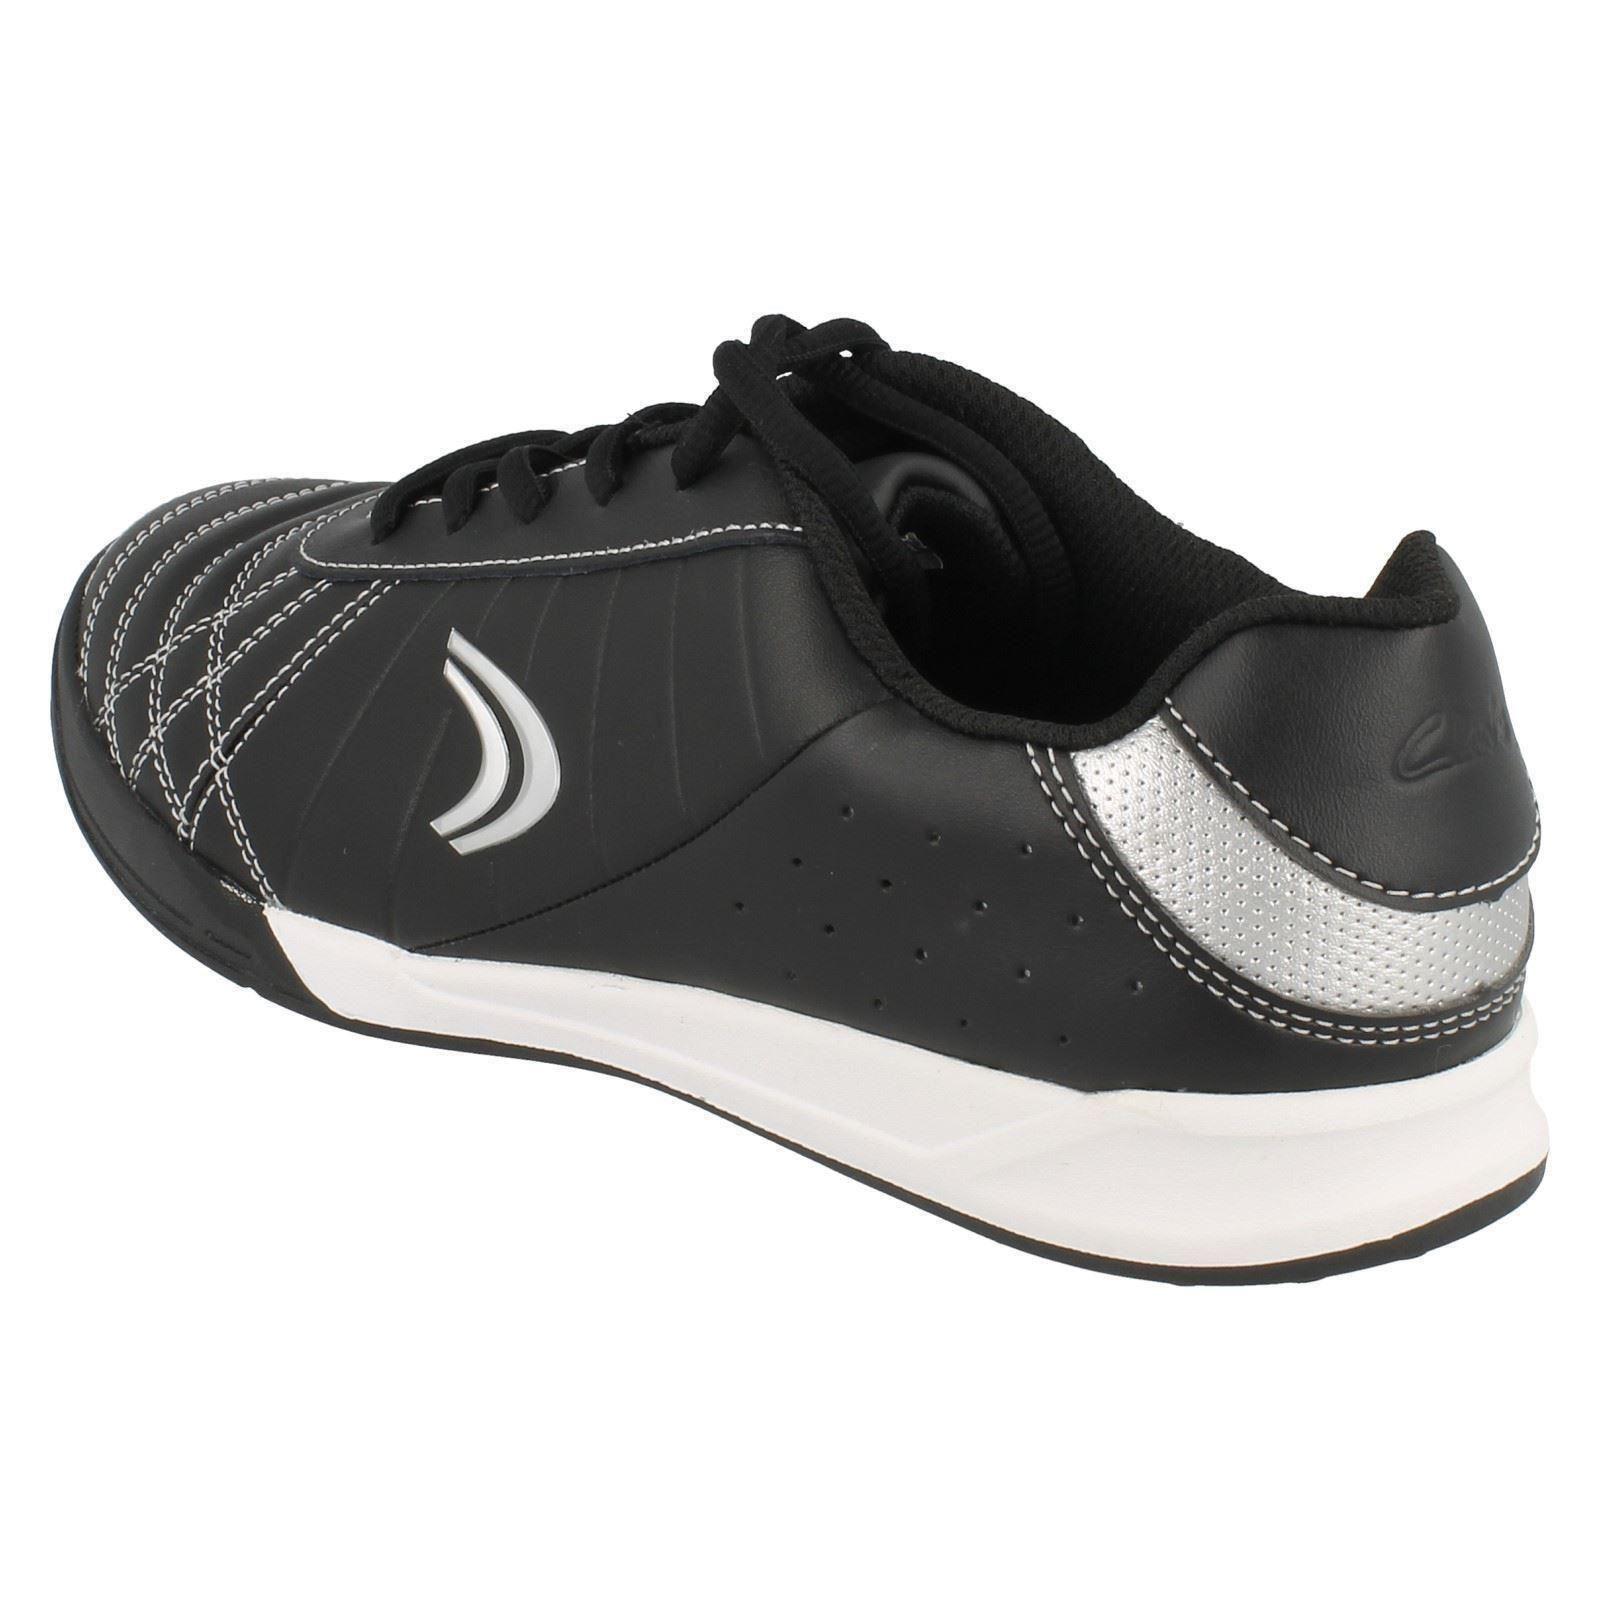 deporte Clarks de Lace Swerve Clarks Black para Toe Zapatillas redondeadas Time Up niños p15q1w